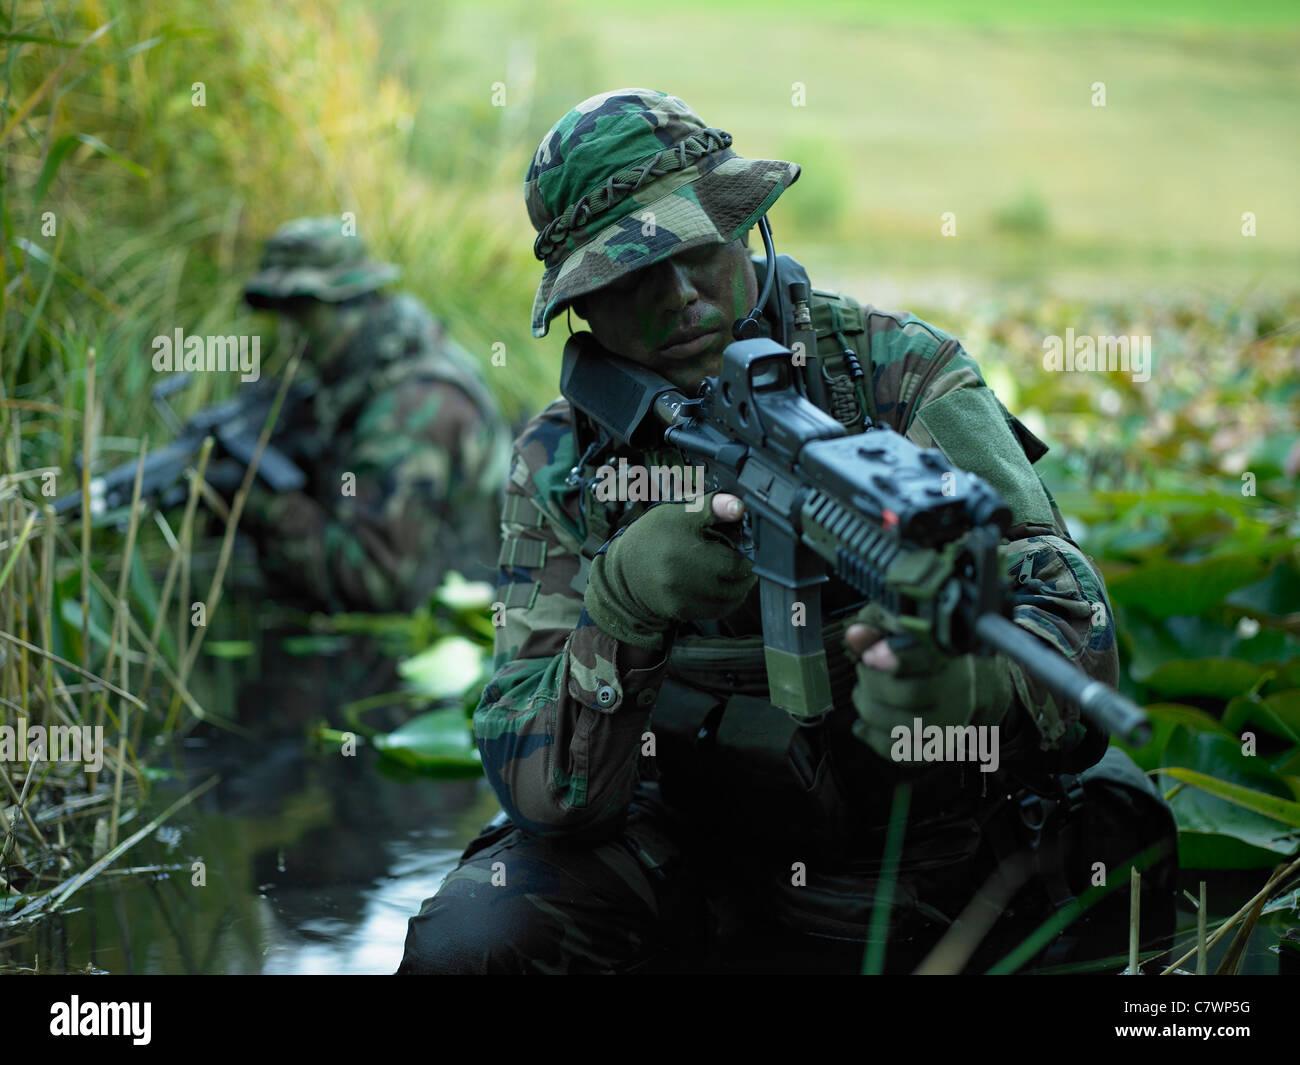 U S  Navy SEALs cross through a stream during combat